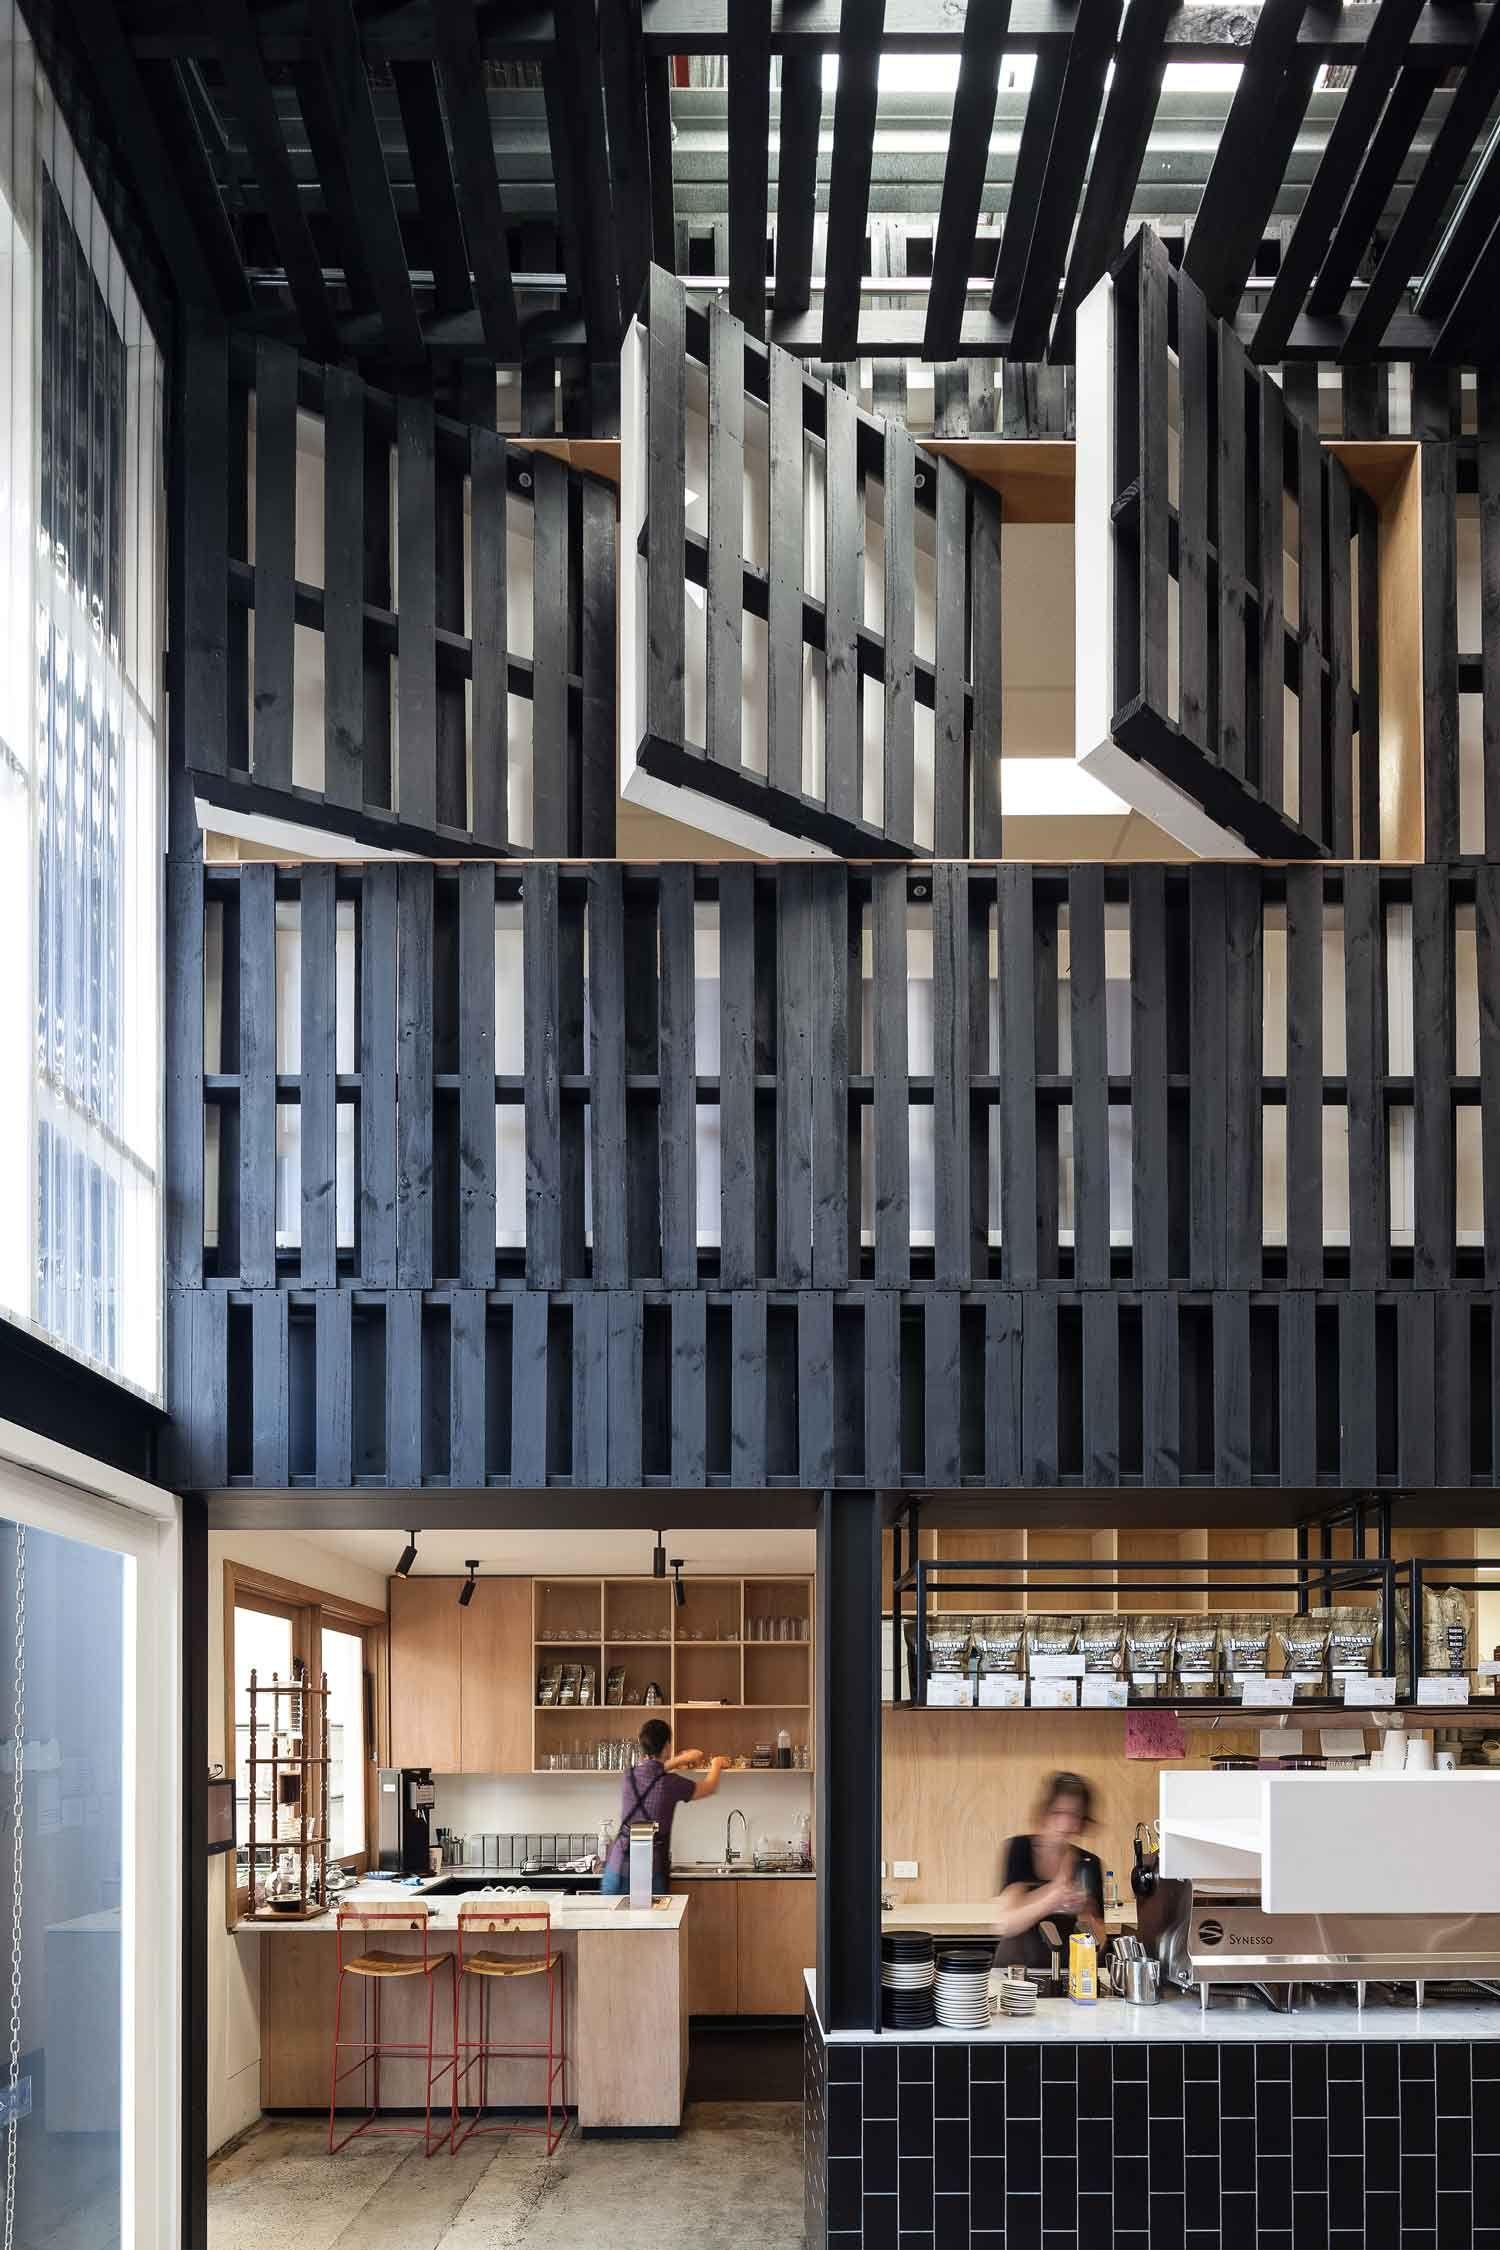 beans café & roasteryfigureground architecture | loft